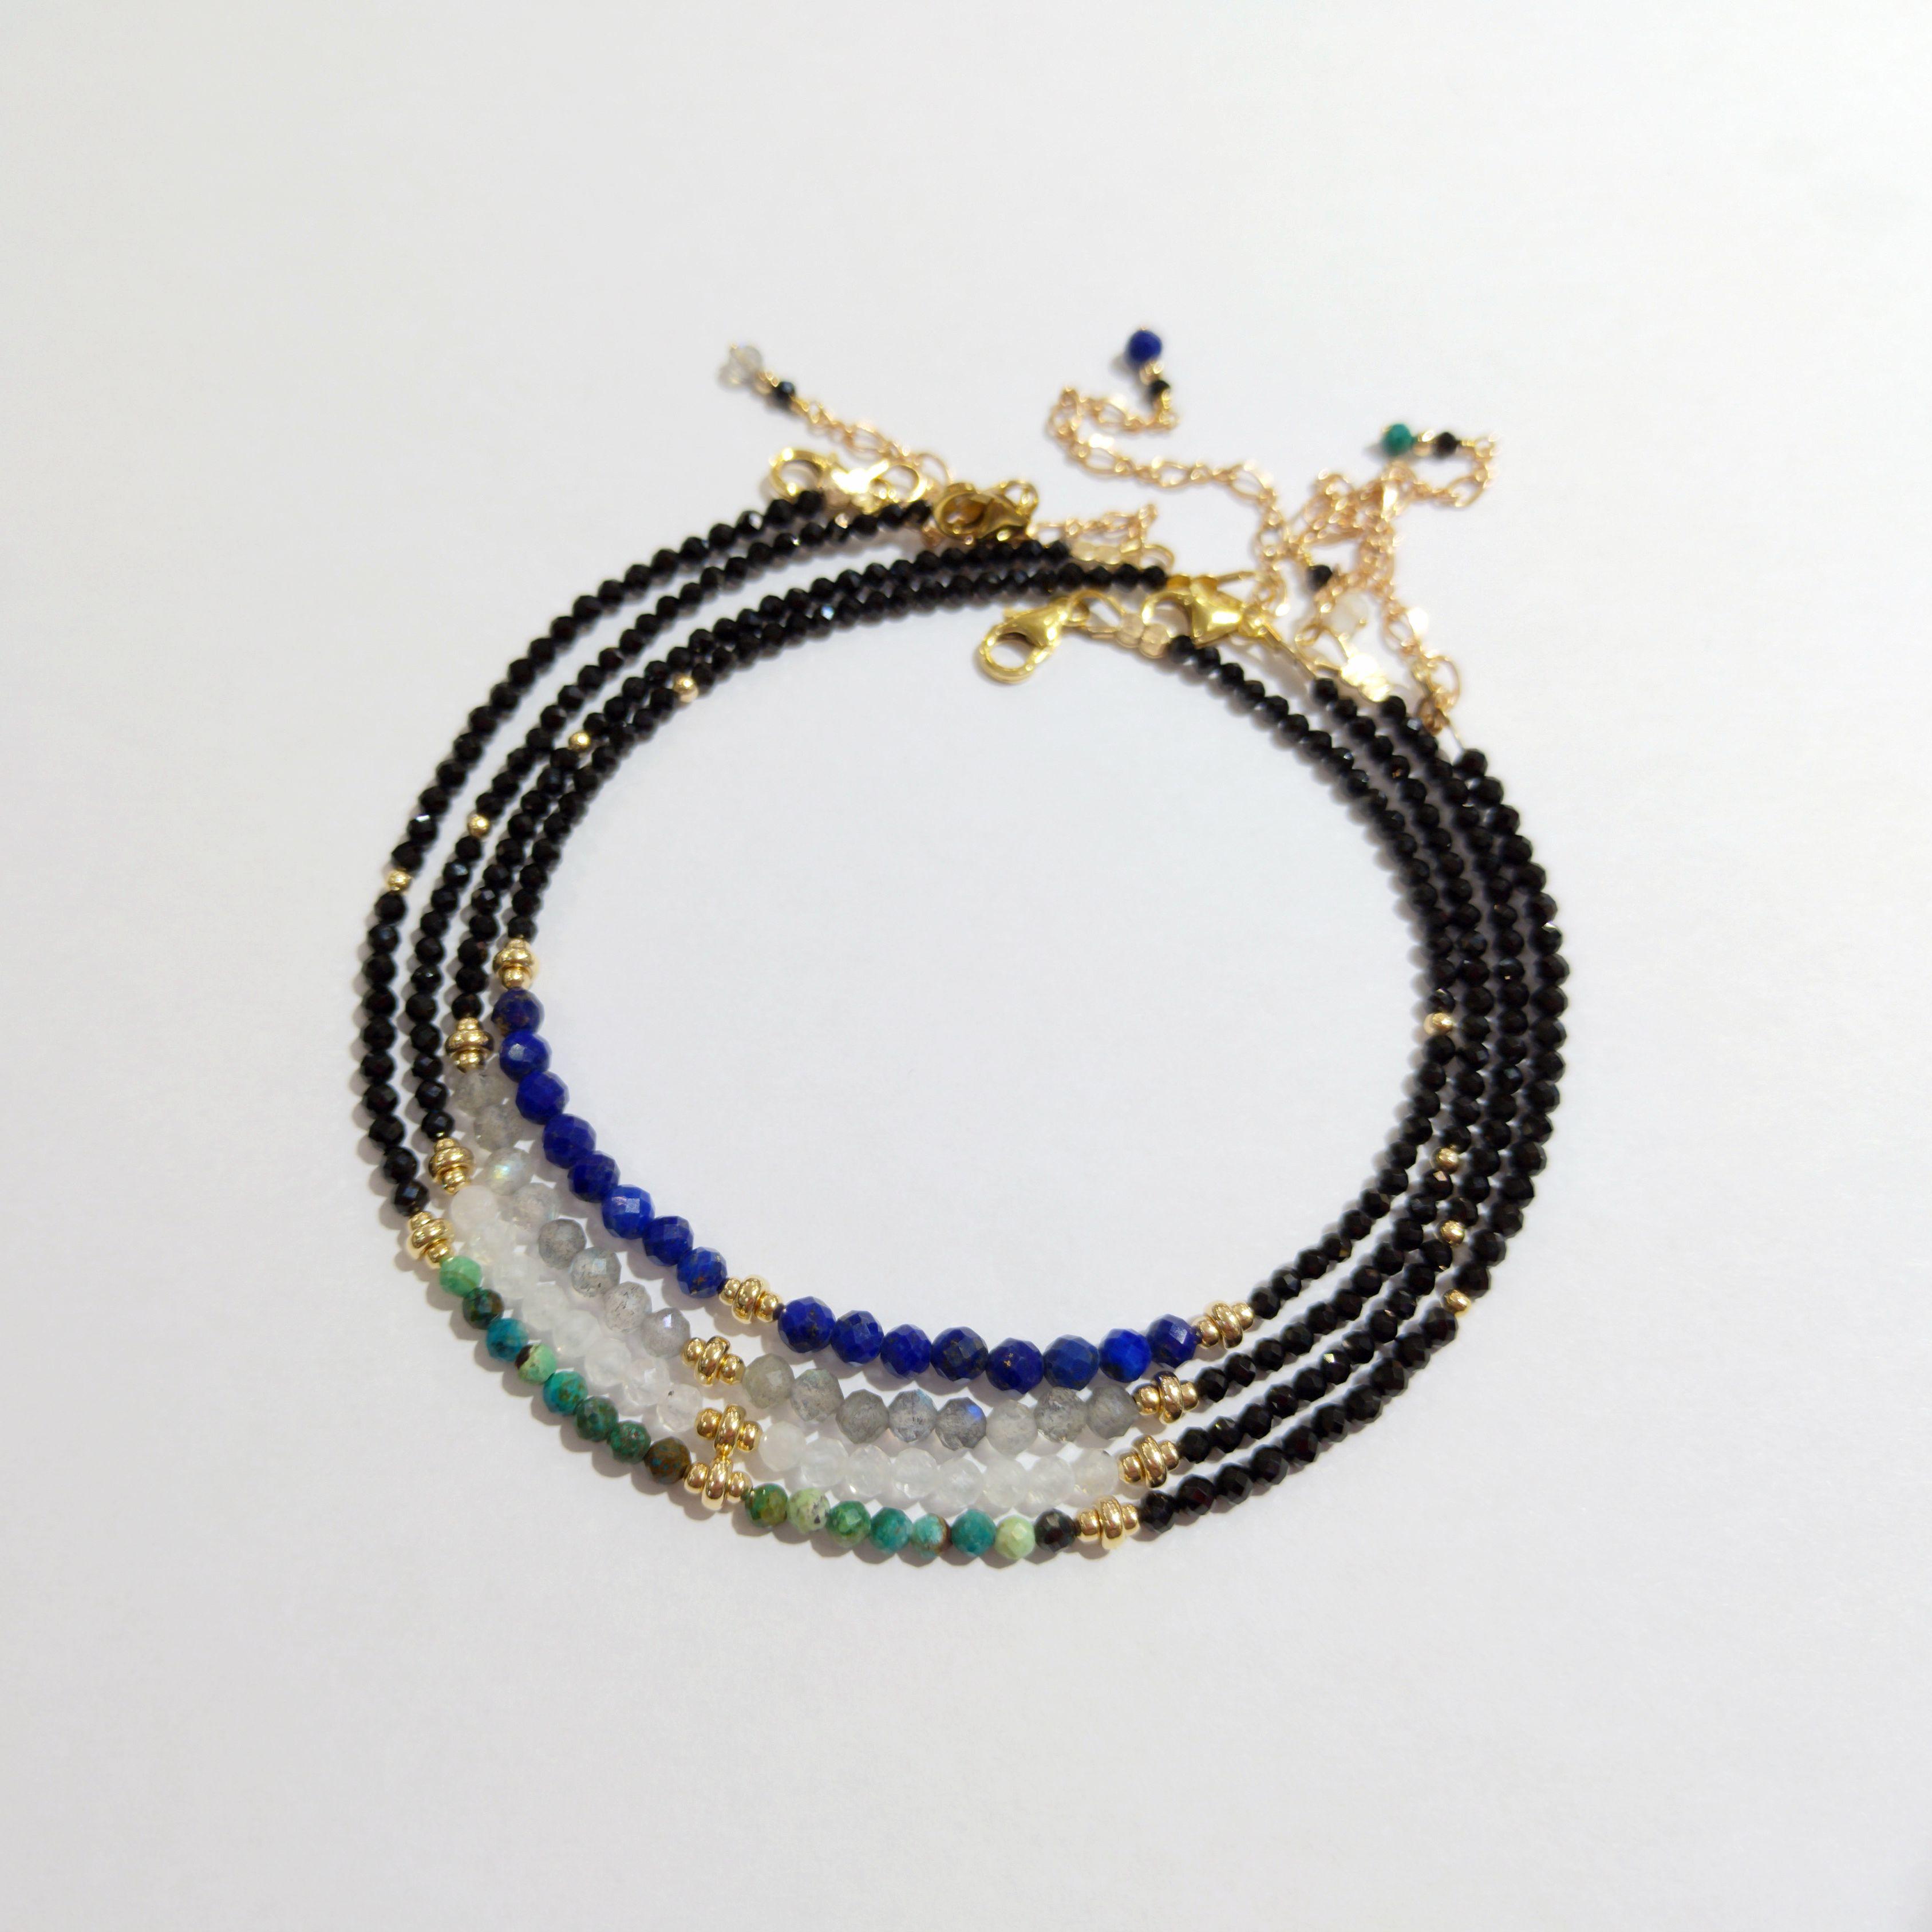 Lii Ji Anklet Natural Stone Black Spinel Lapis Lazuli Moonstone Labradorite Chrysocolla US 9K GF Anklet 23cm with extra link